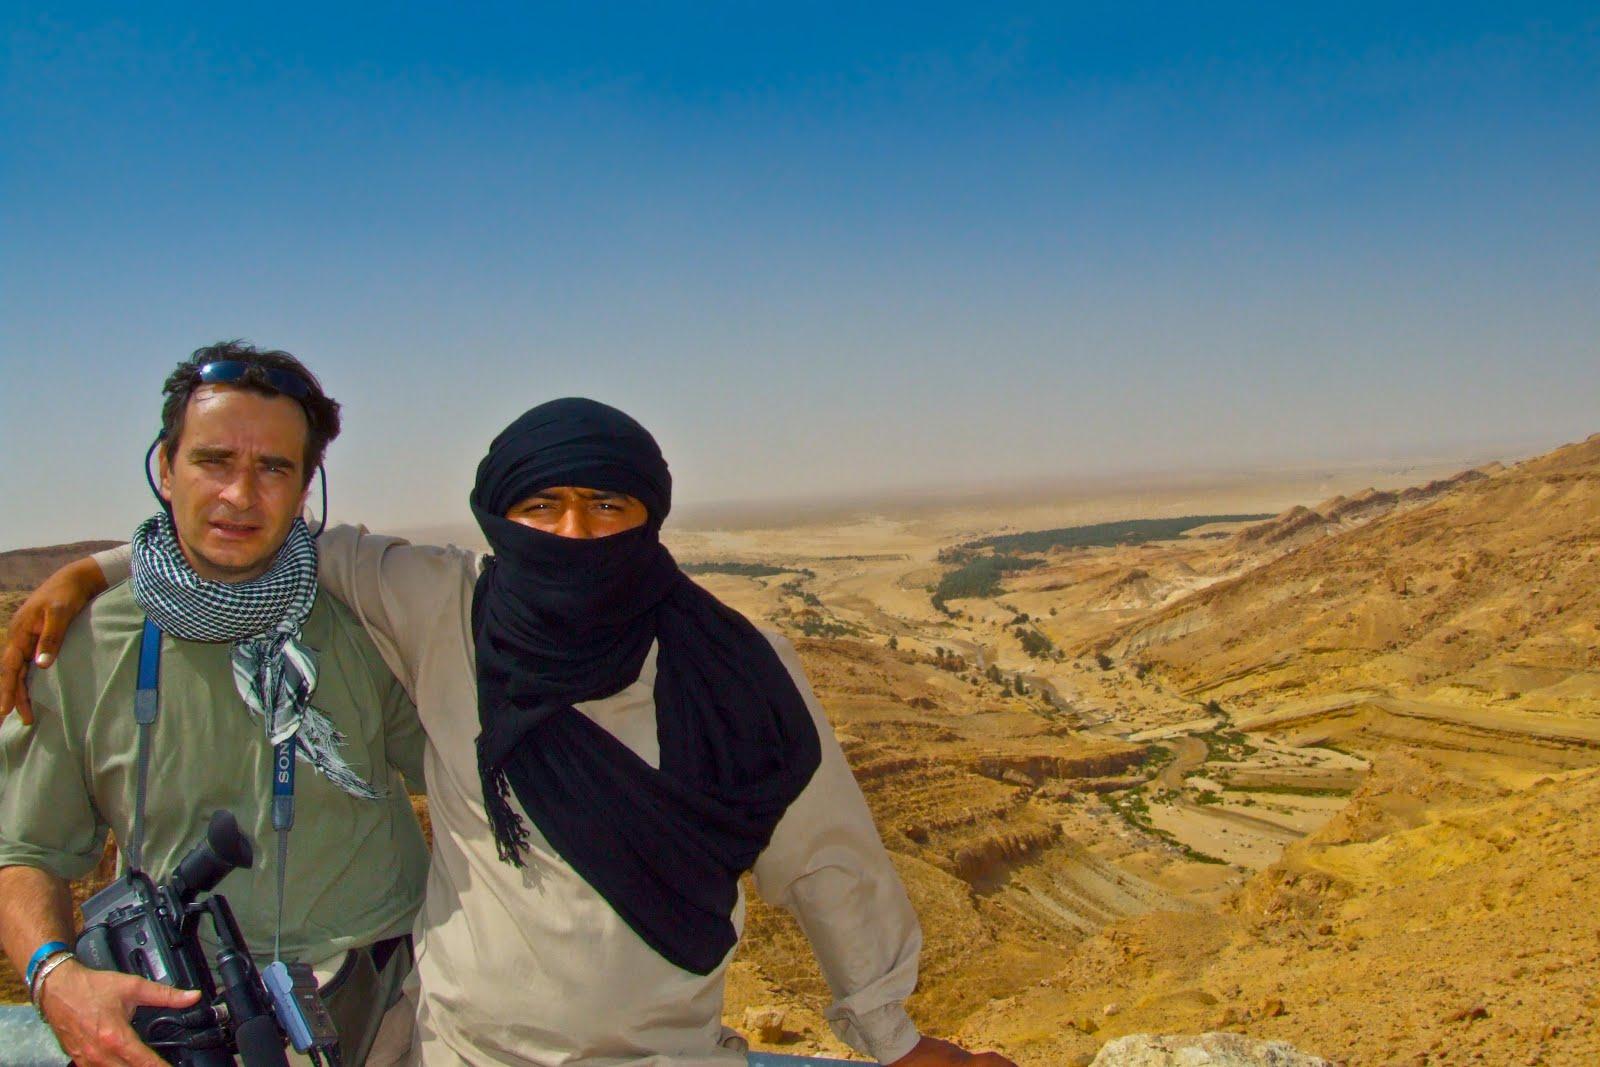 Me and mujahedin